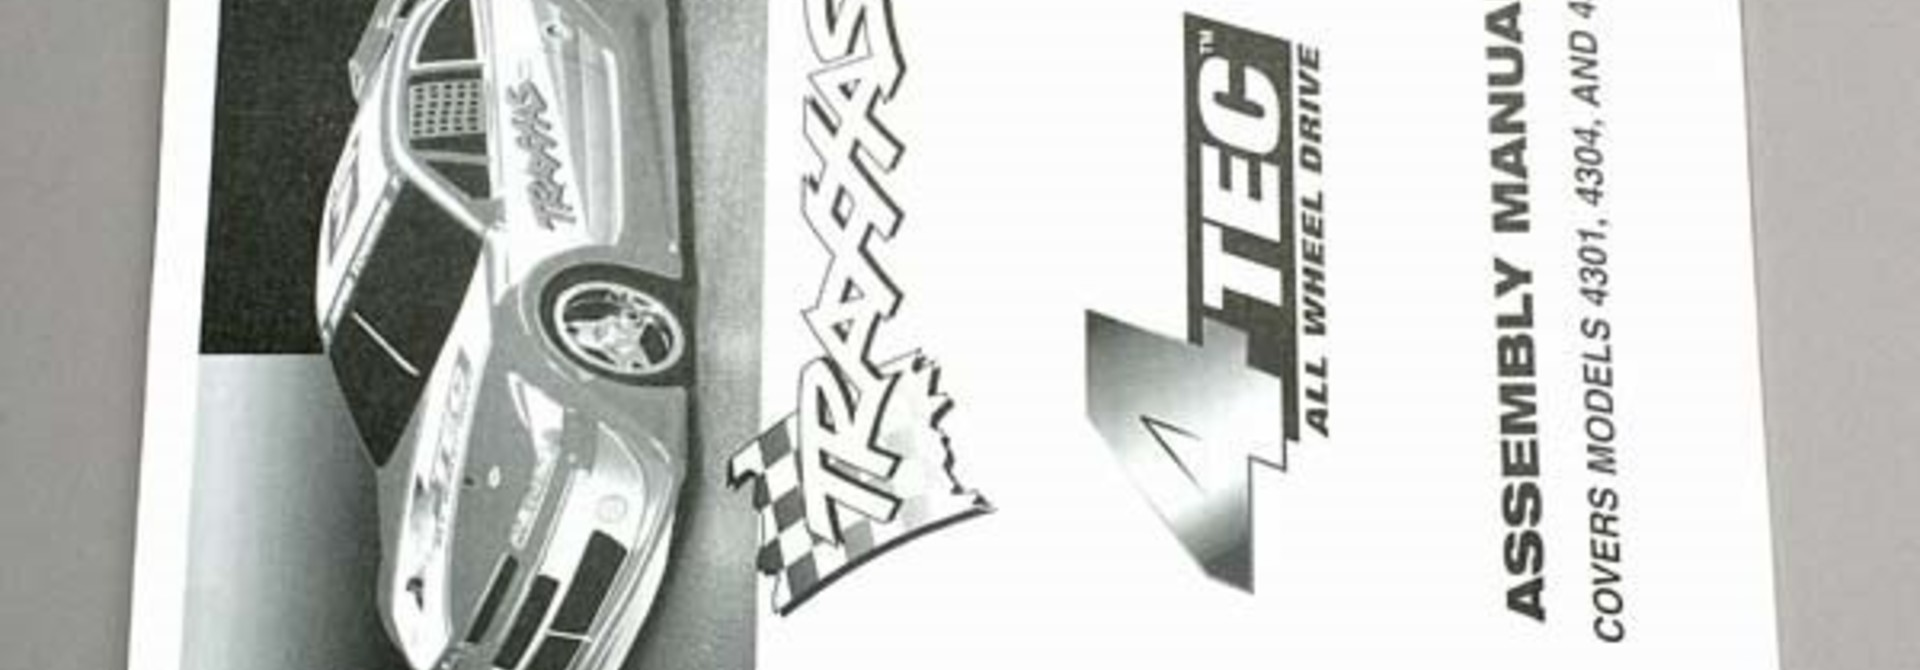 Assembly manual, 4-Tec, TRX4399